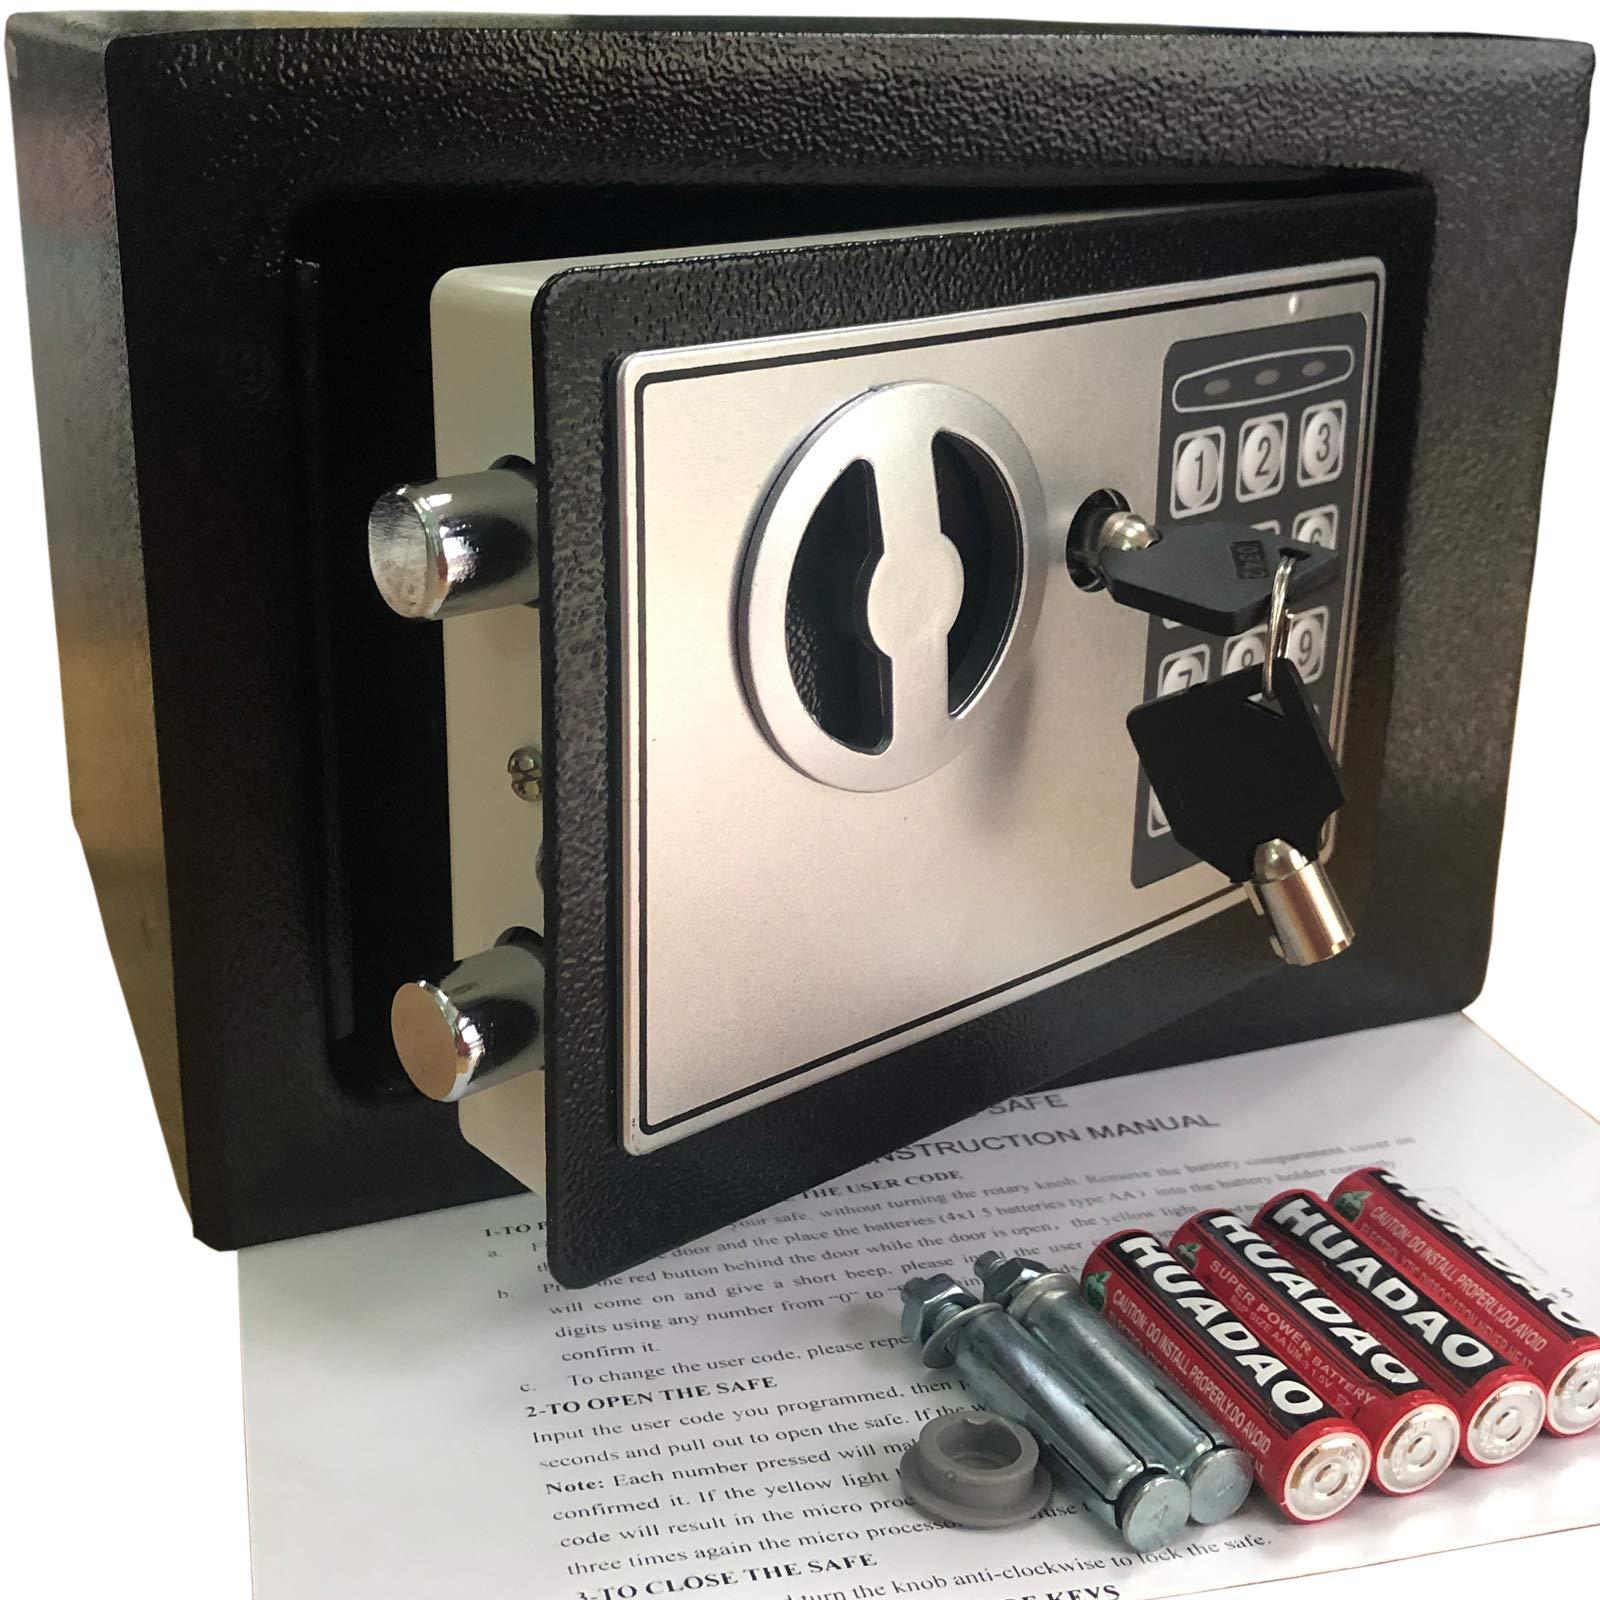 Yuanshikj Electronic Deluxe Digital Security Safe Box Keypad Lock Home Office Hotel Business Jewelry Gun Cash Use Storage Money (Black 1) by Yuanshikj